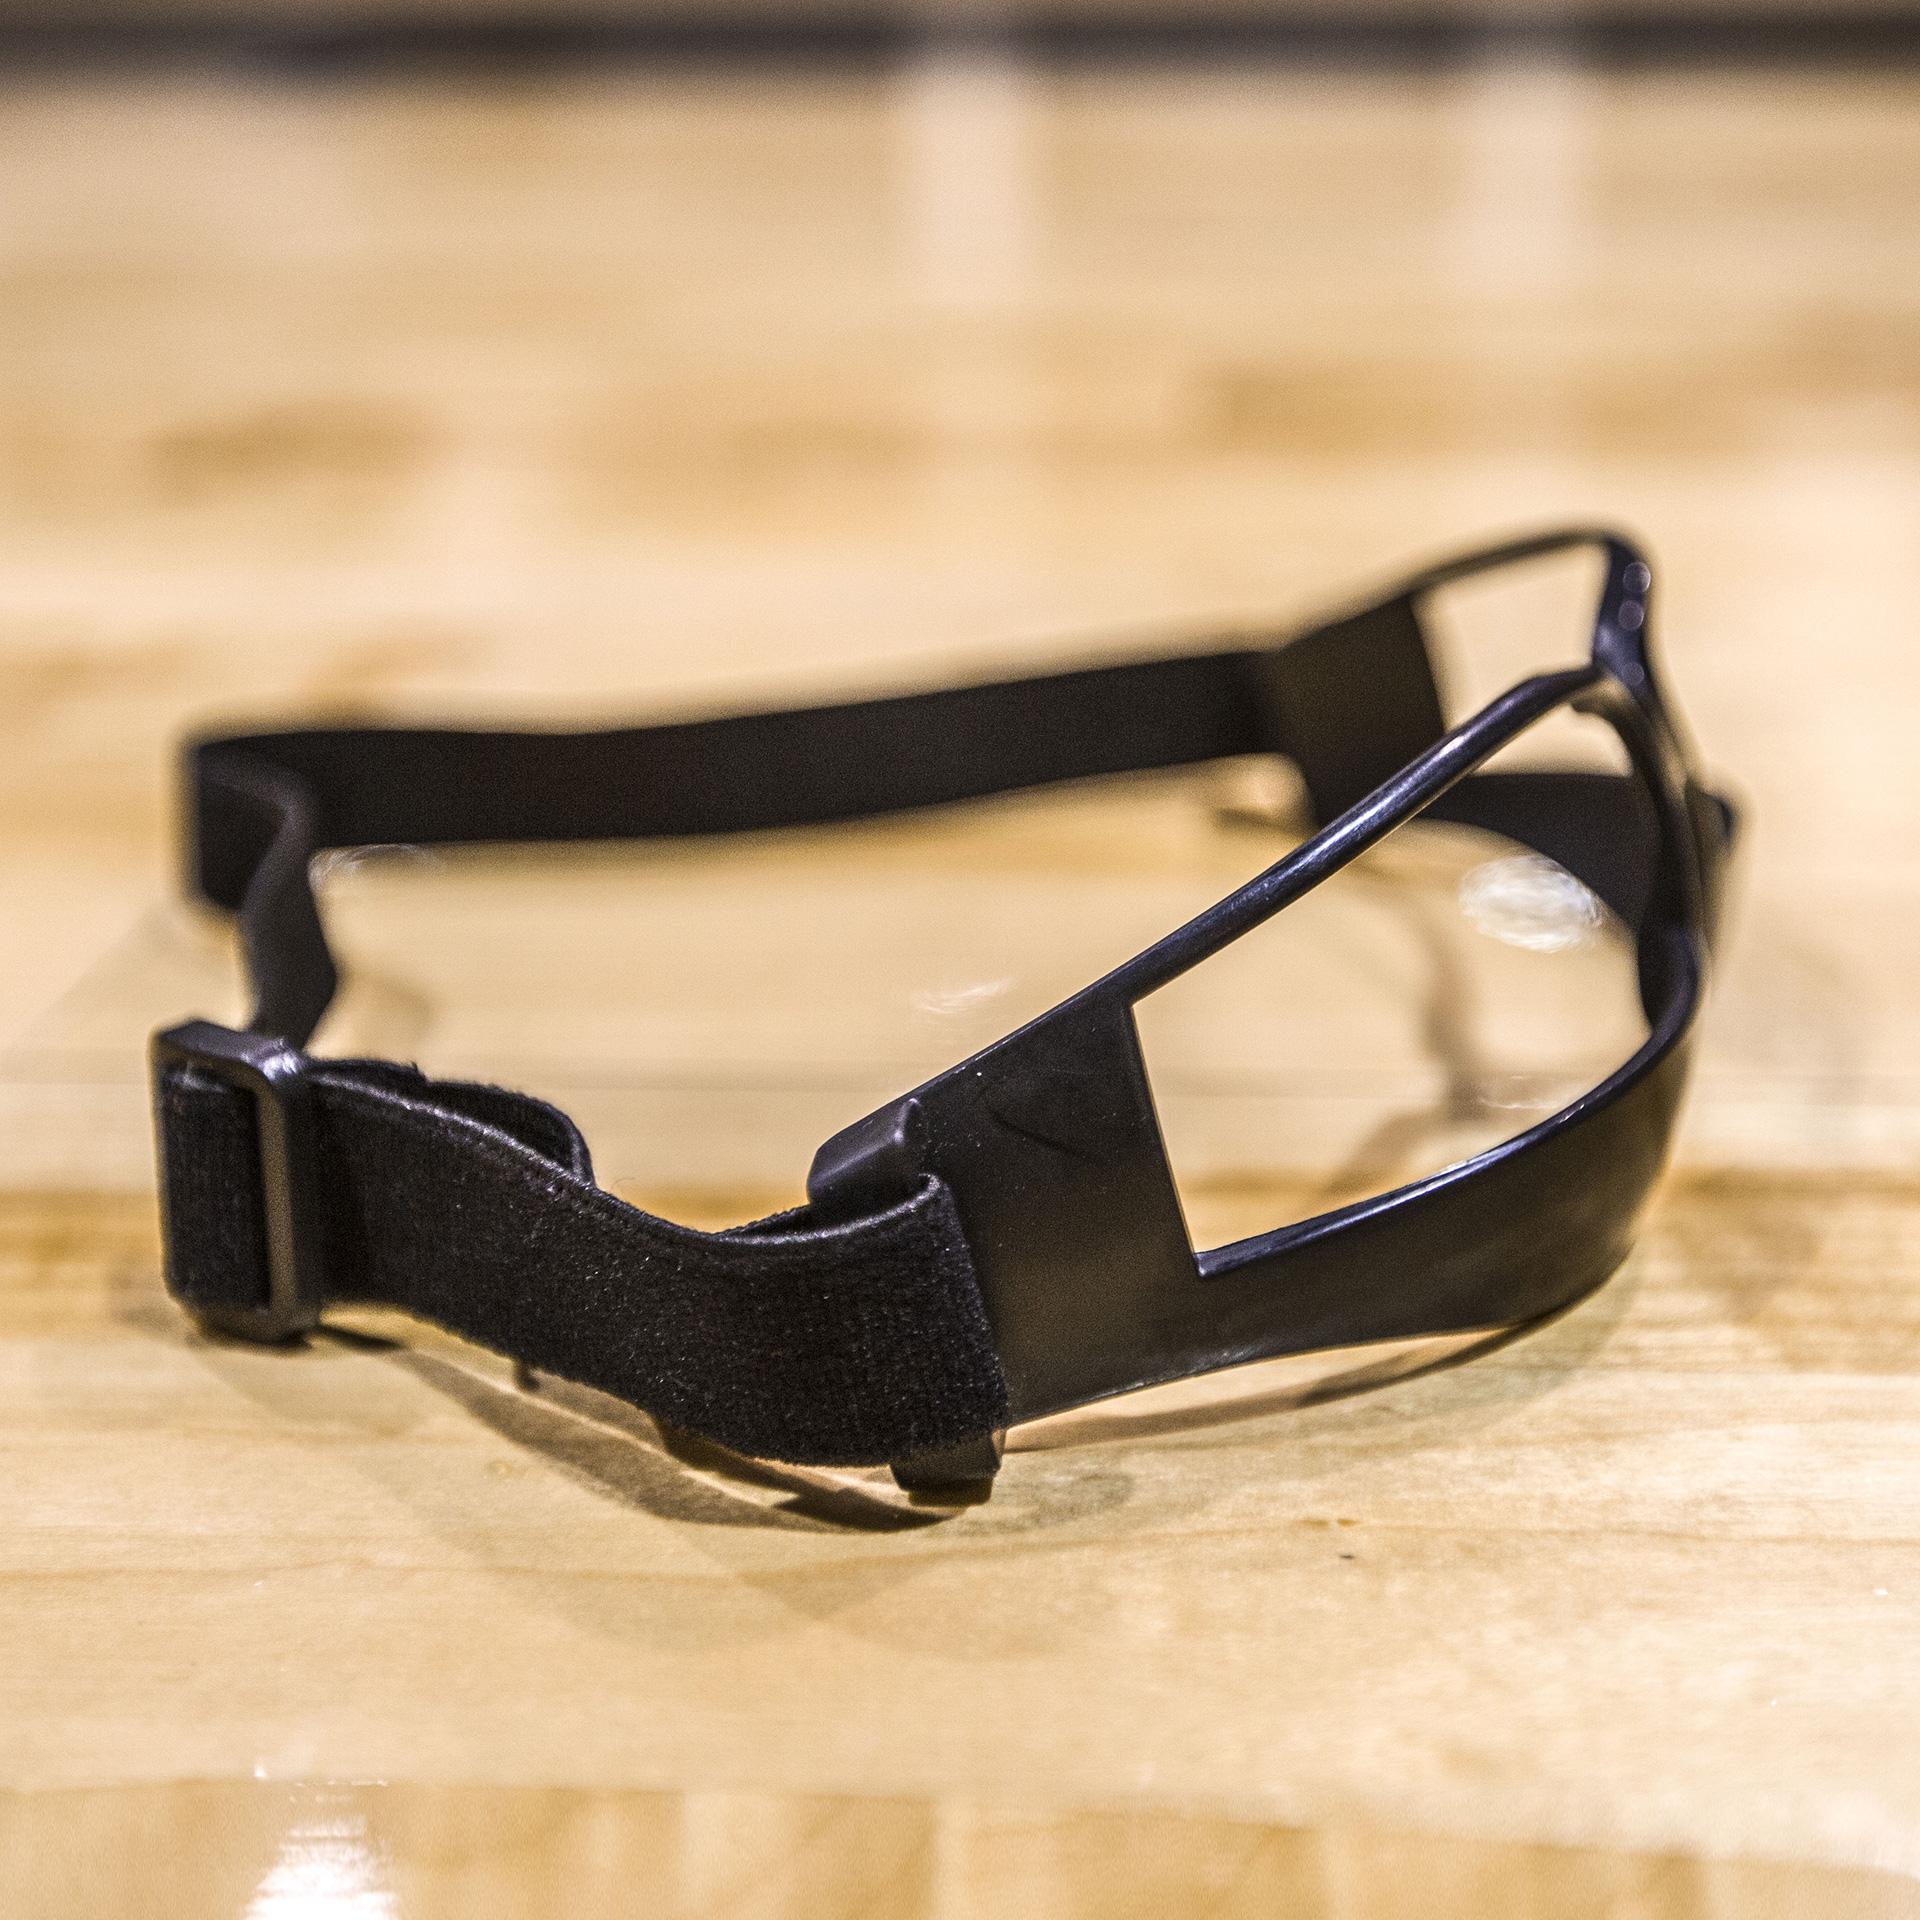 черный  тренажёр get ripped gr dribbling sunglasses GR-006-15 - цена, описание, фото 1